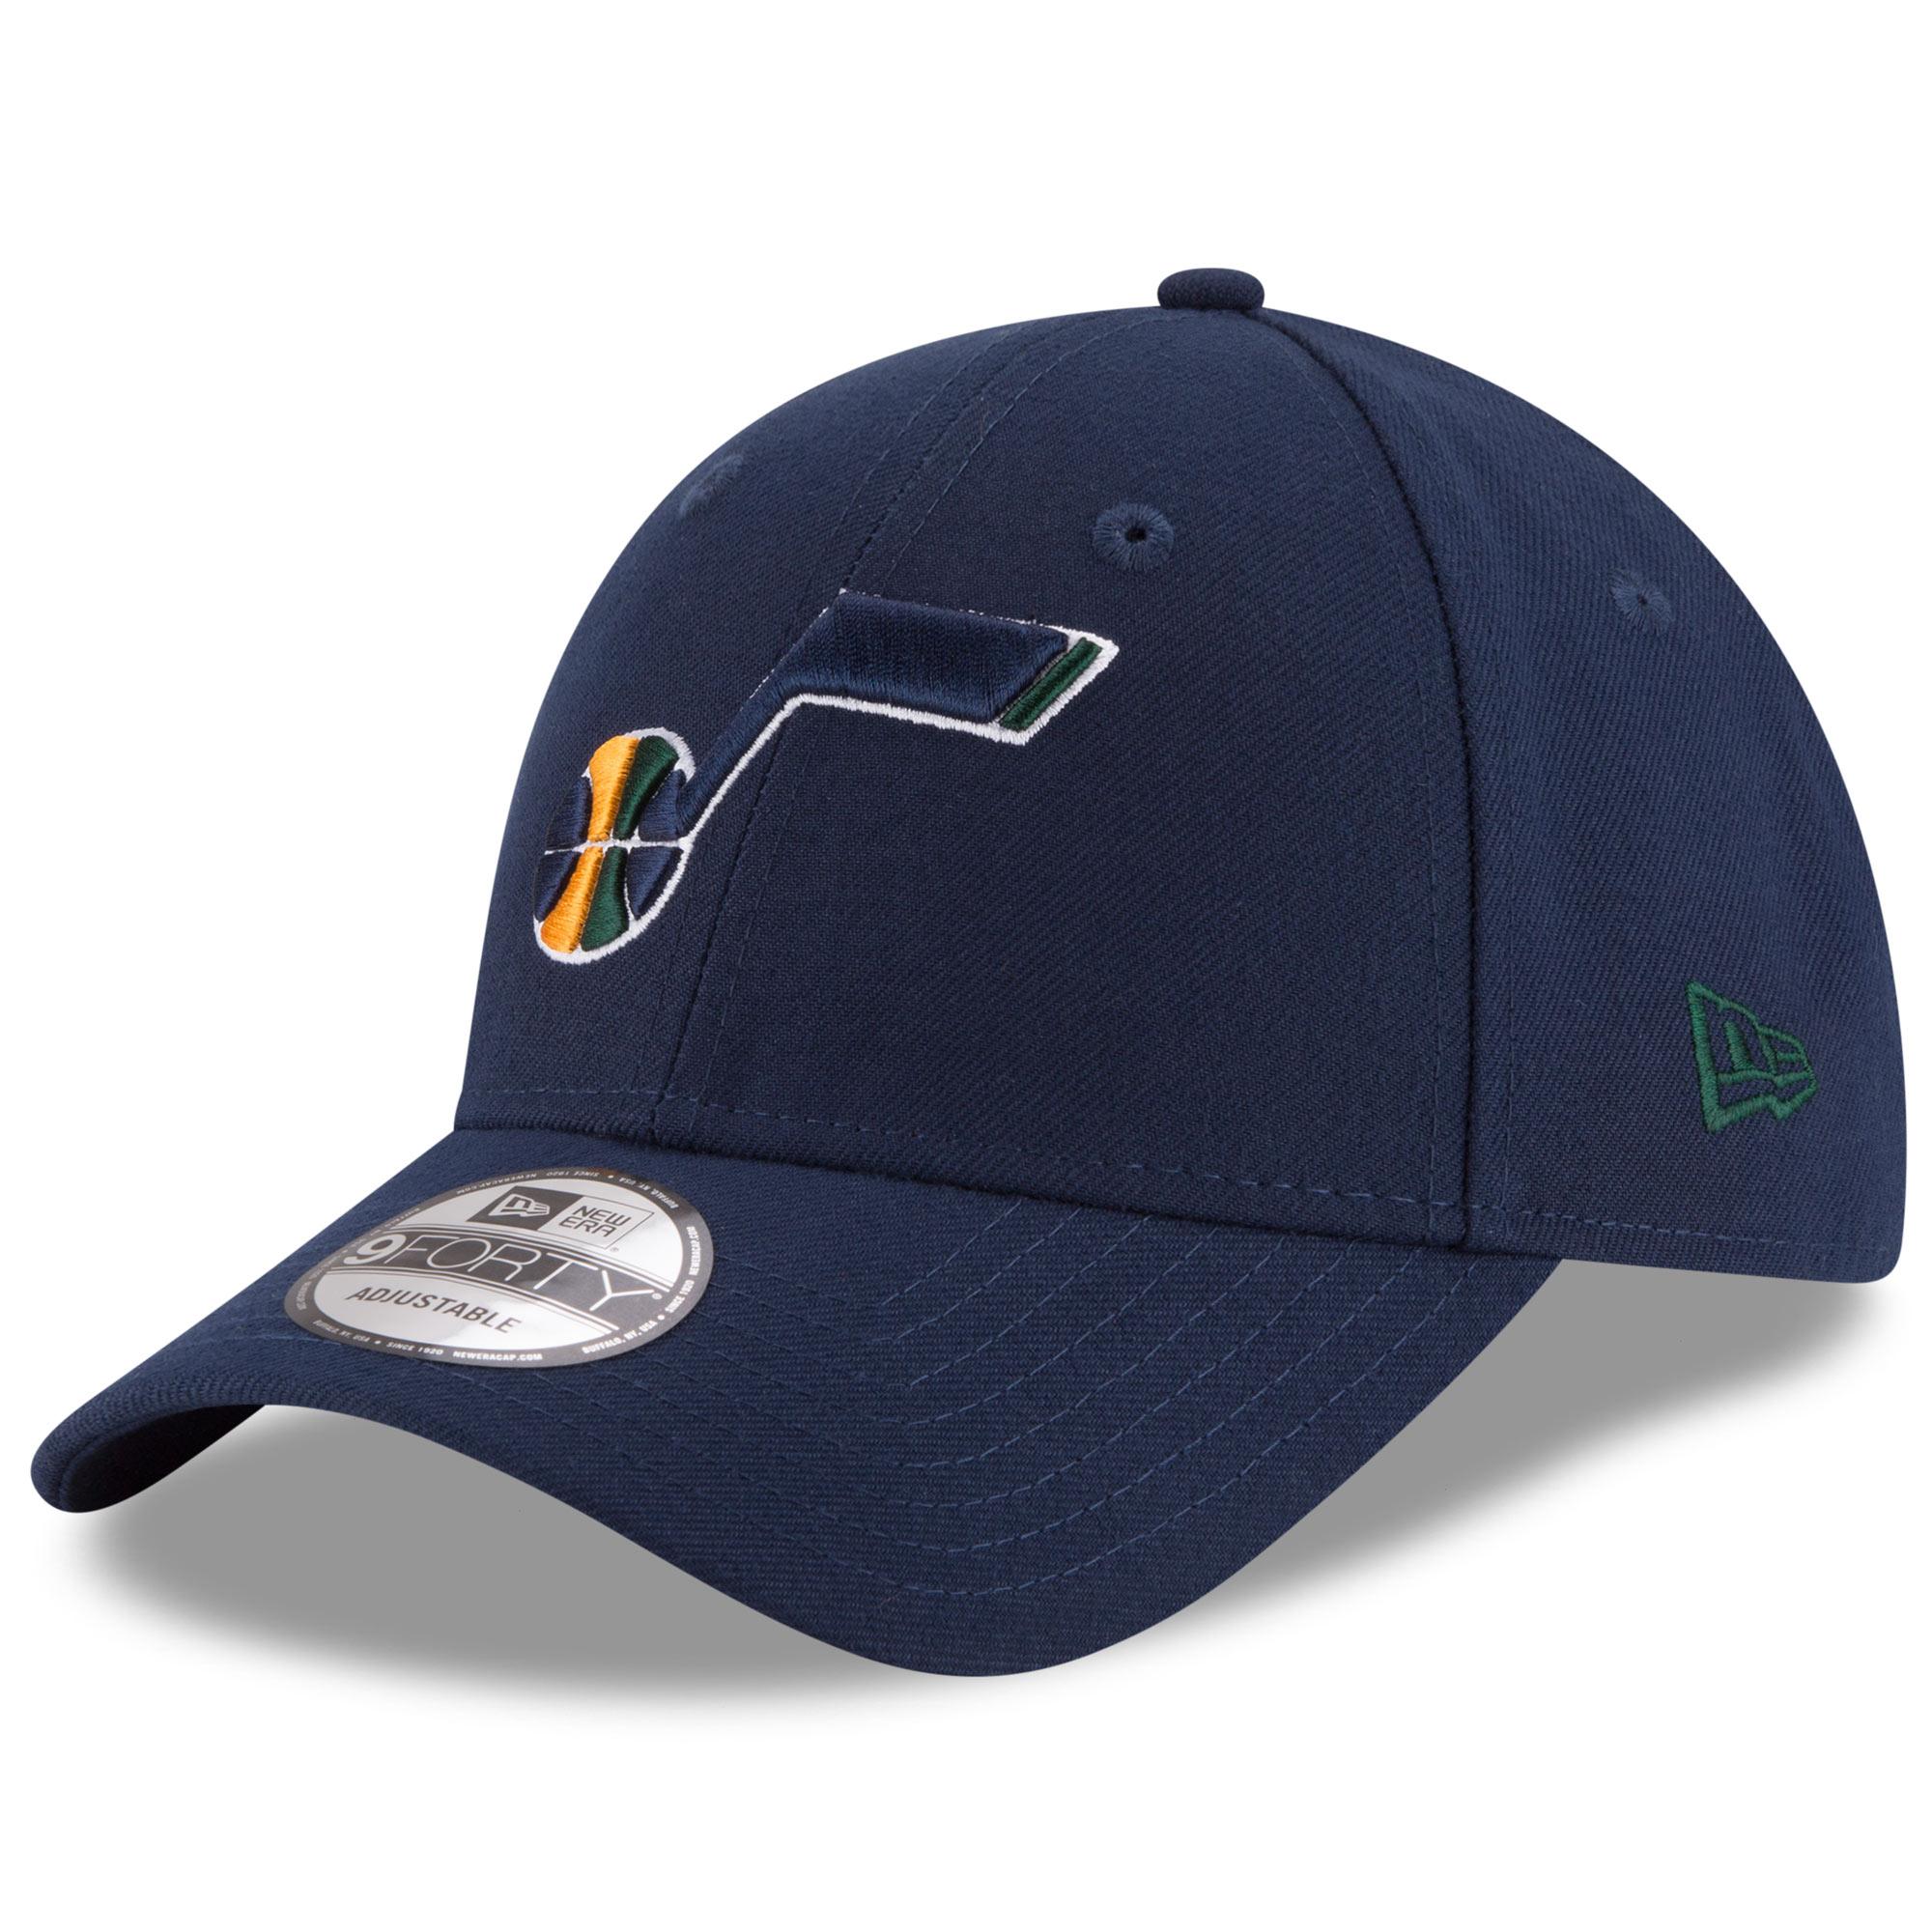 Utah Jazz New Era Official Team Color 9FORTY Adjustable Hat - Navy